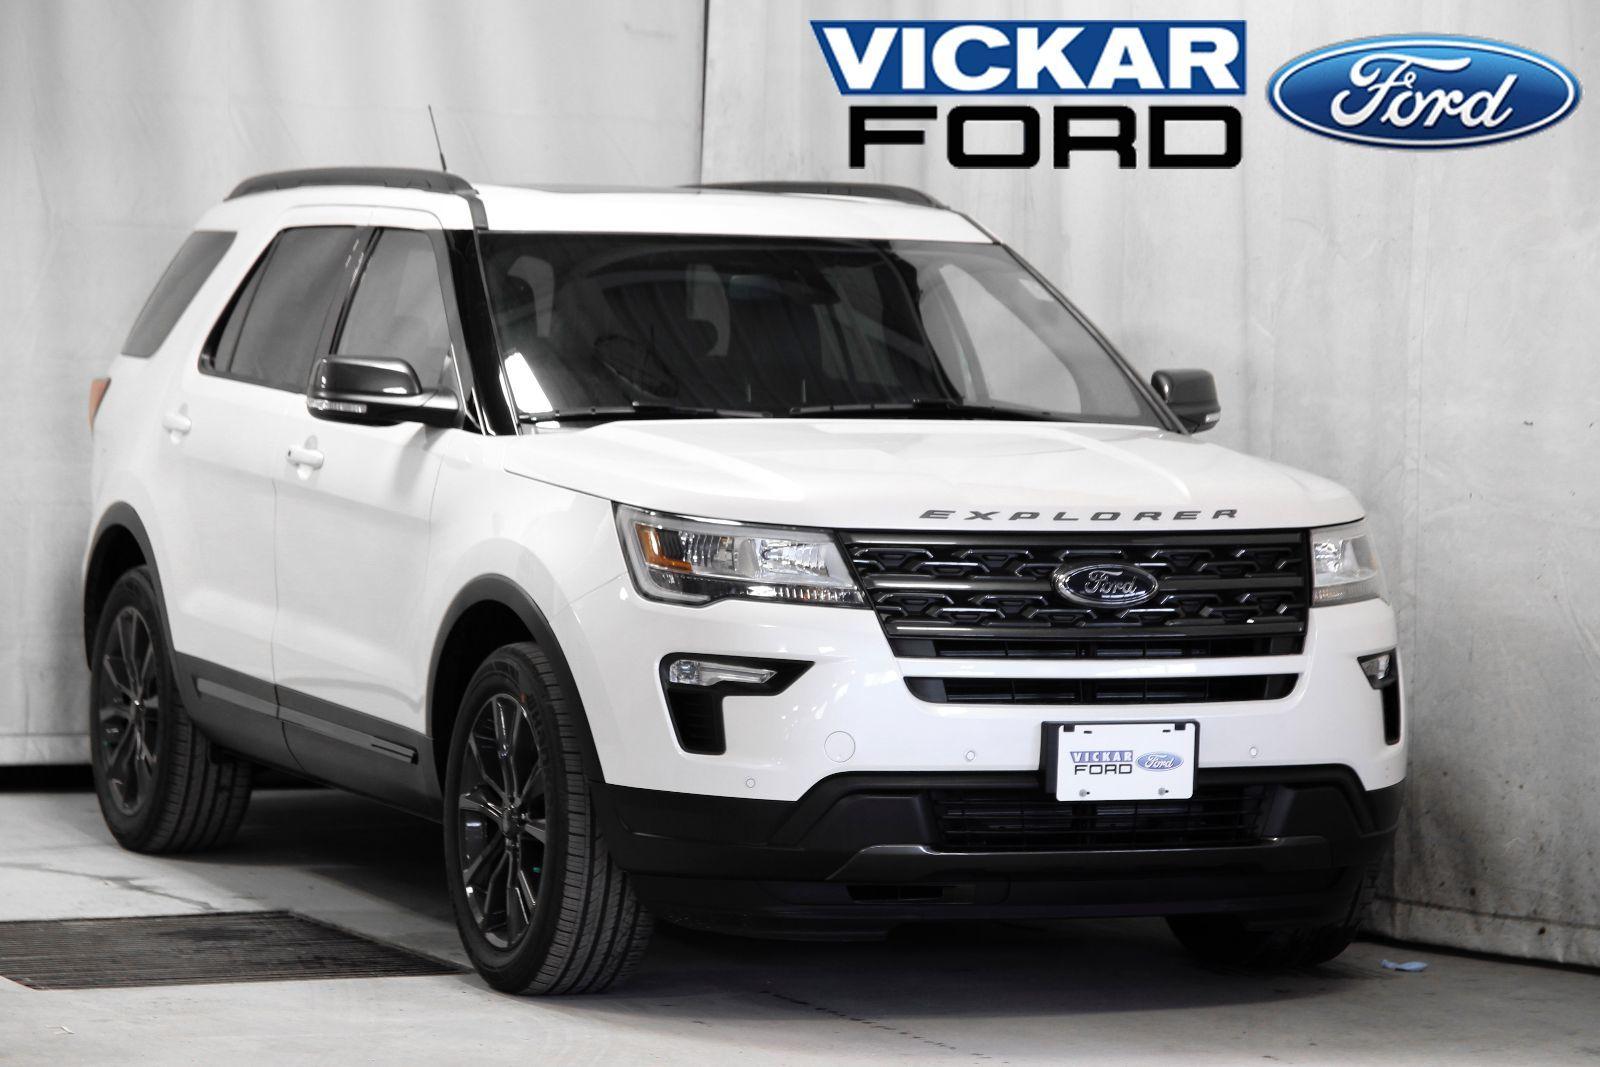 New 2018 Ford Explorer XLT White Platinum Metallic Tri-Coat for sale -  $46838.0 | #18T9426 | Vickar Ford | Winnipeg